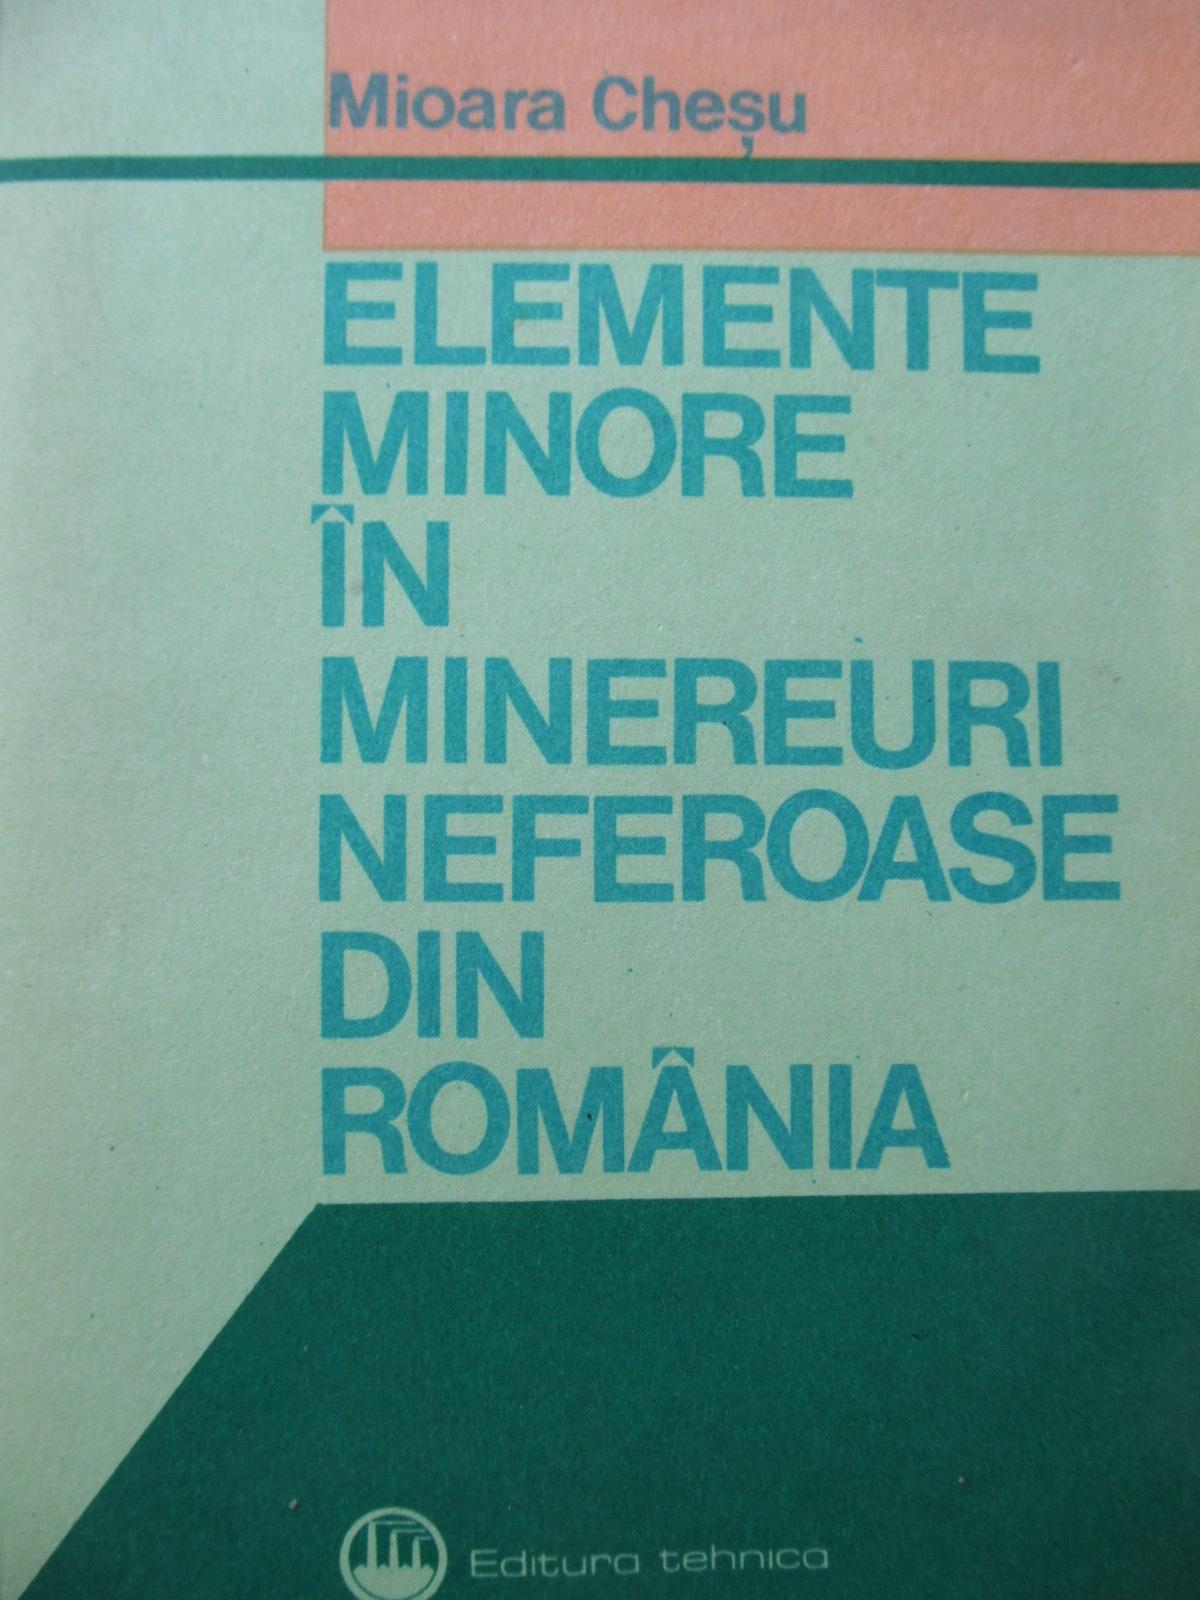 Elemente minore in minereuri neferoase din Romania - Mioara Chesu | Detalii carte